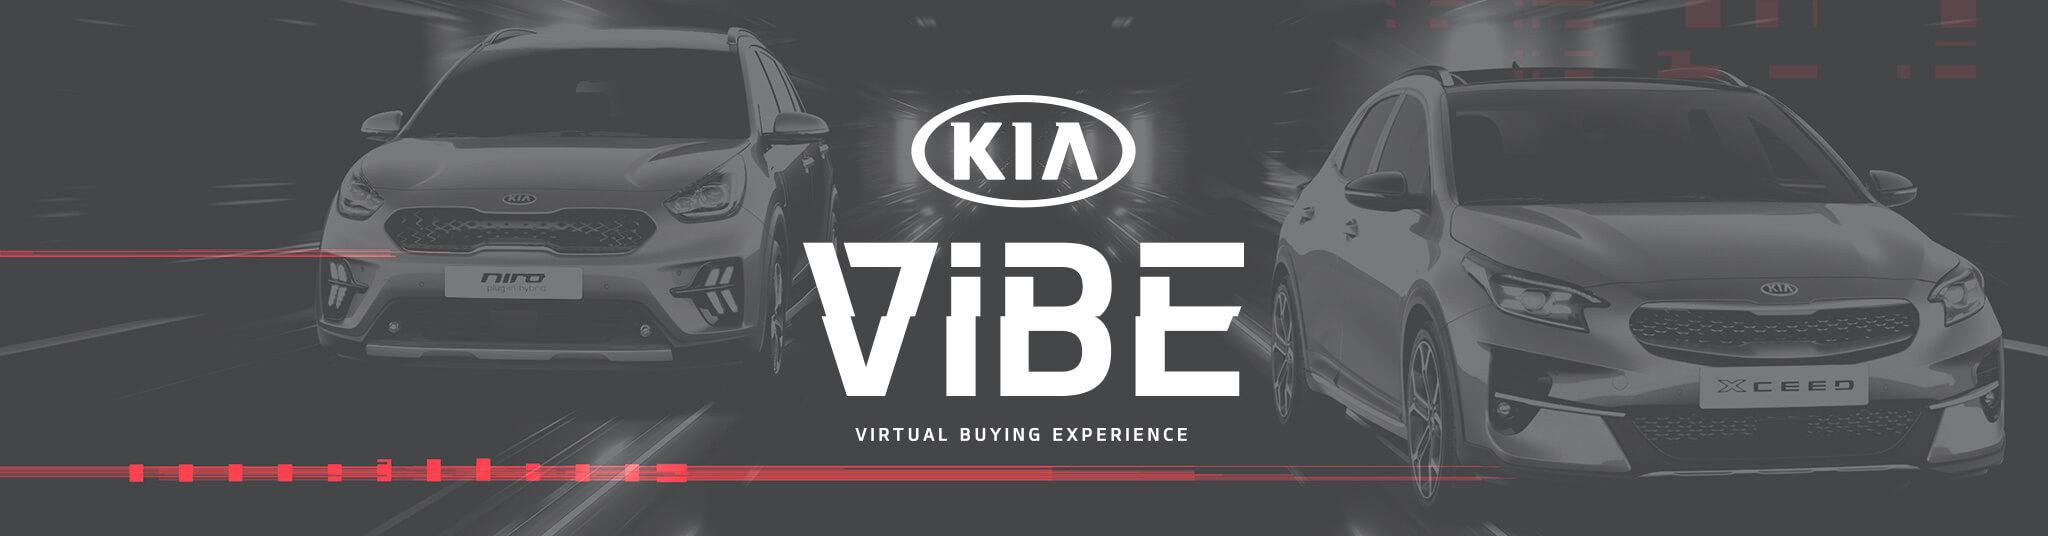 Kia Vibe